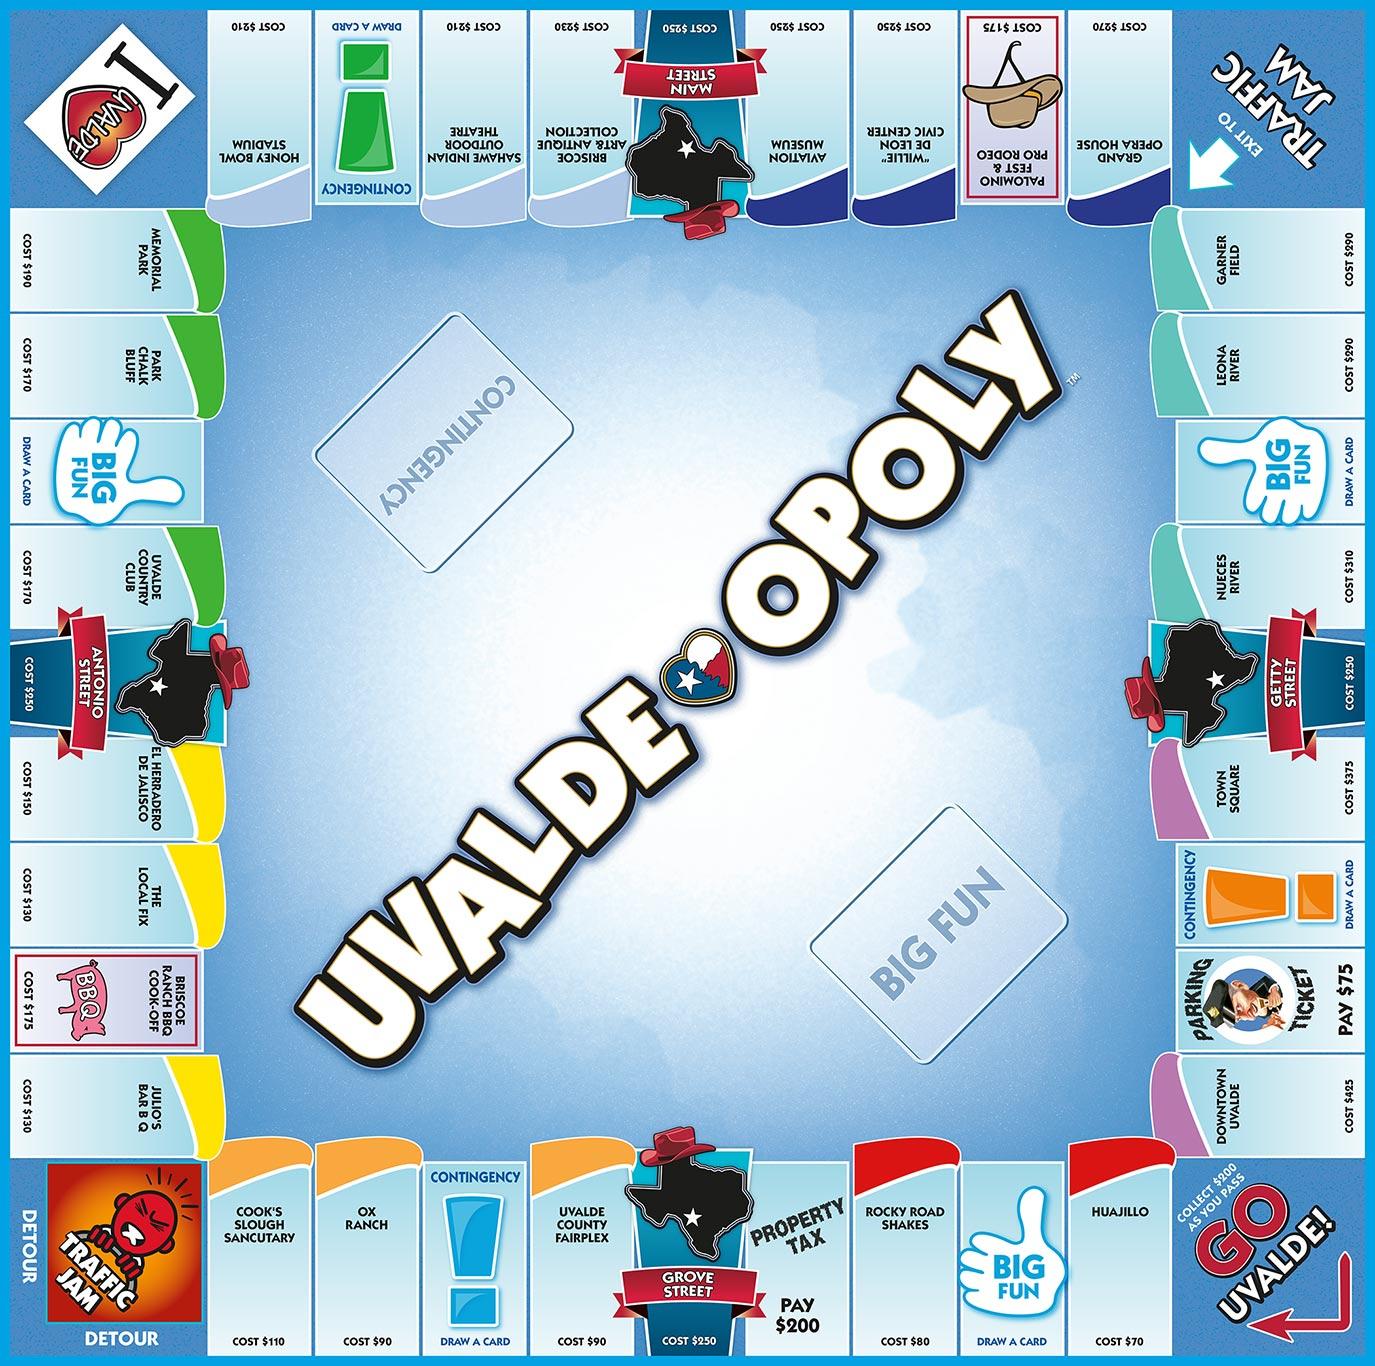 UVALDE-OPOLY Board Game